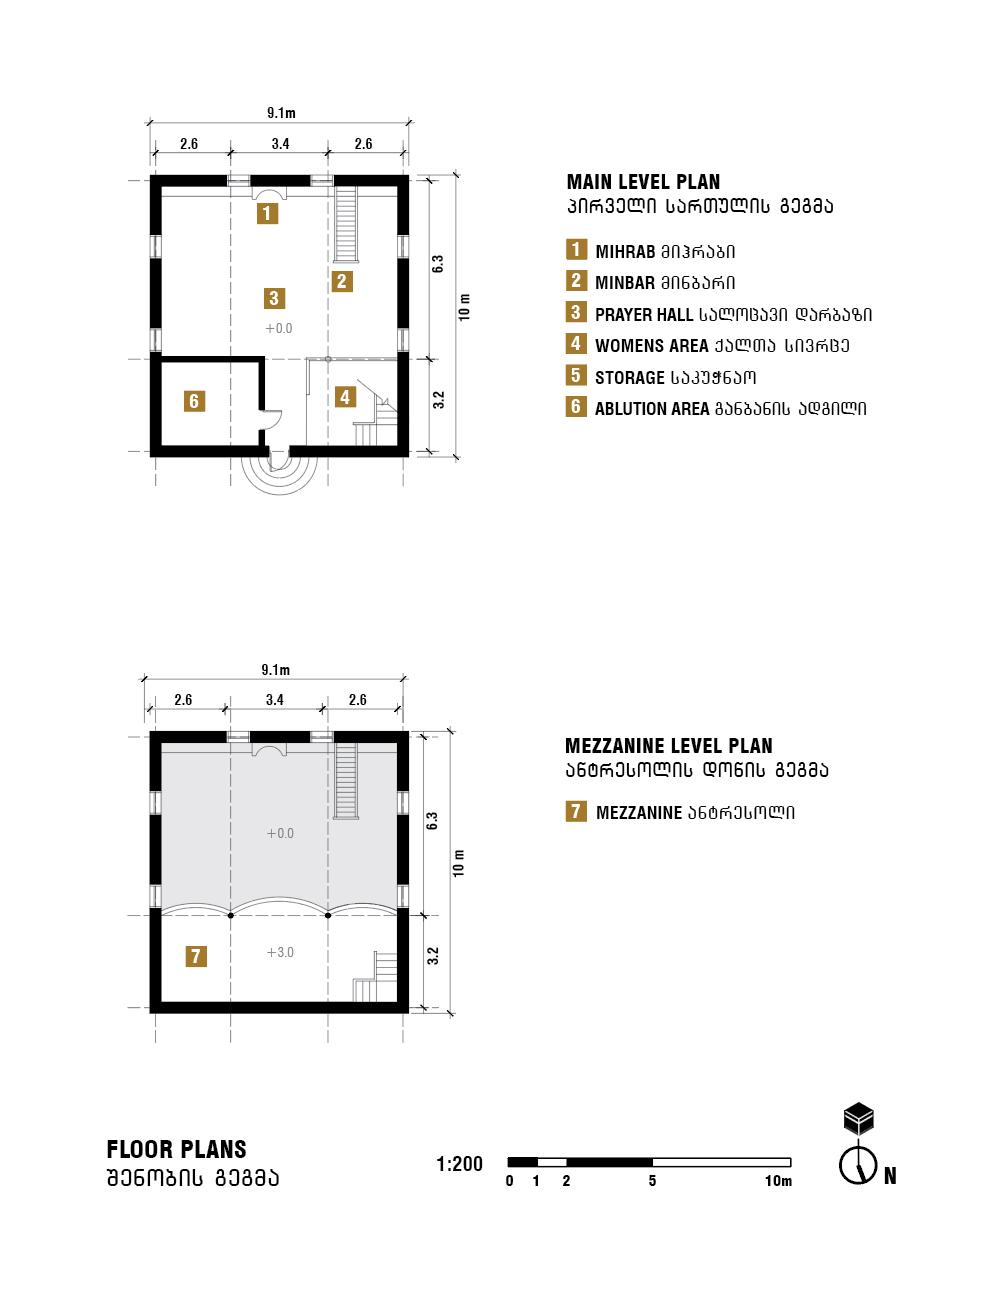 BZUBZU_Floorplans 1-200.jpg